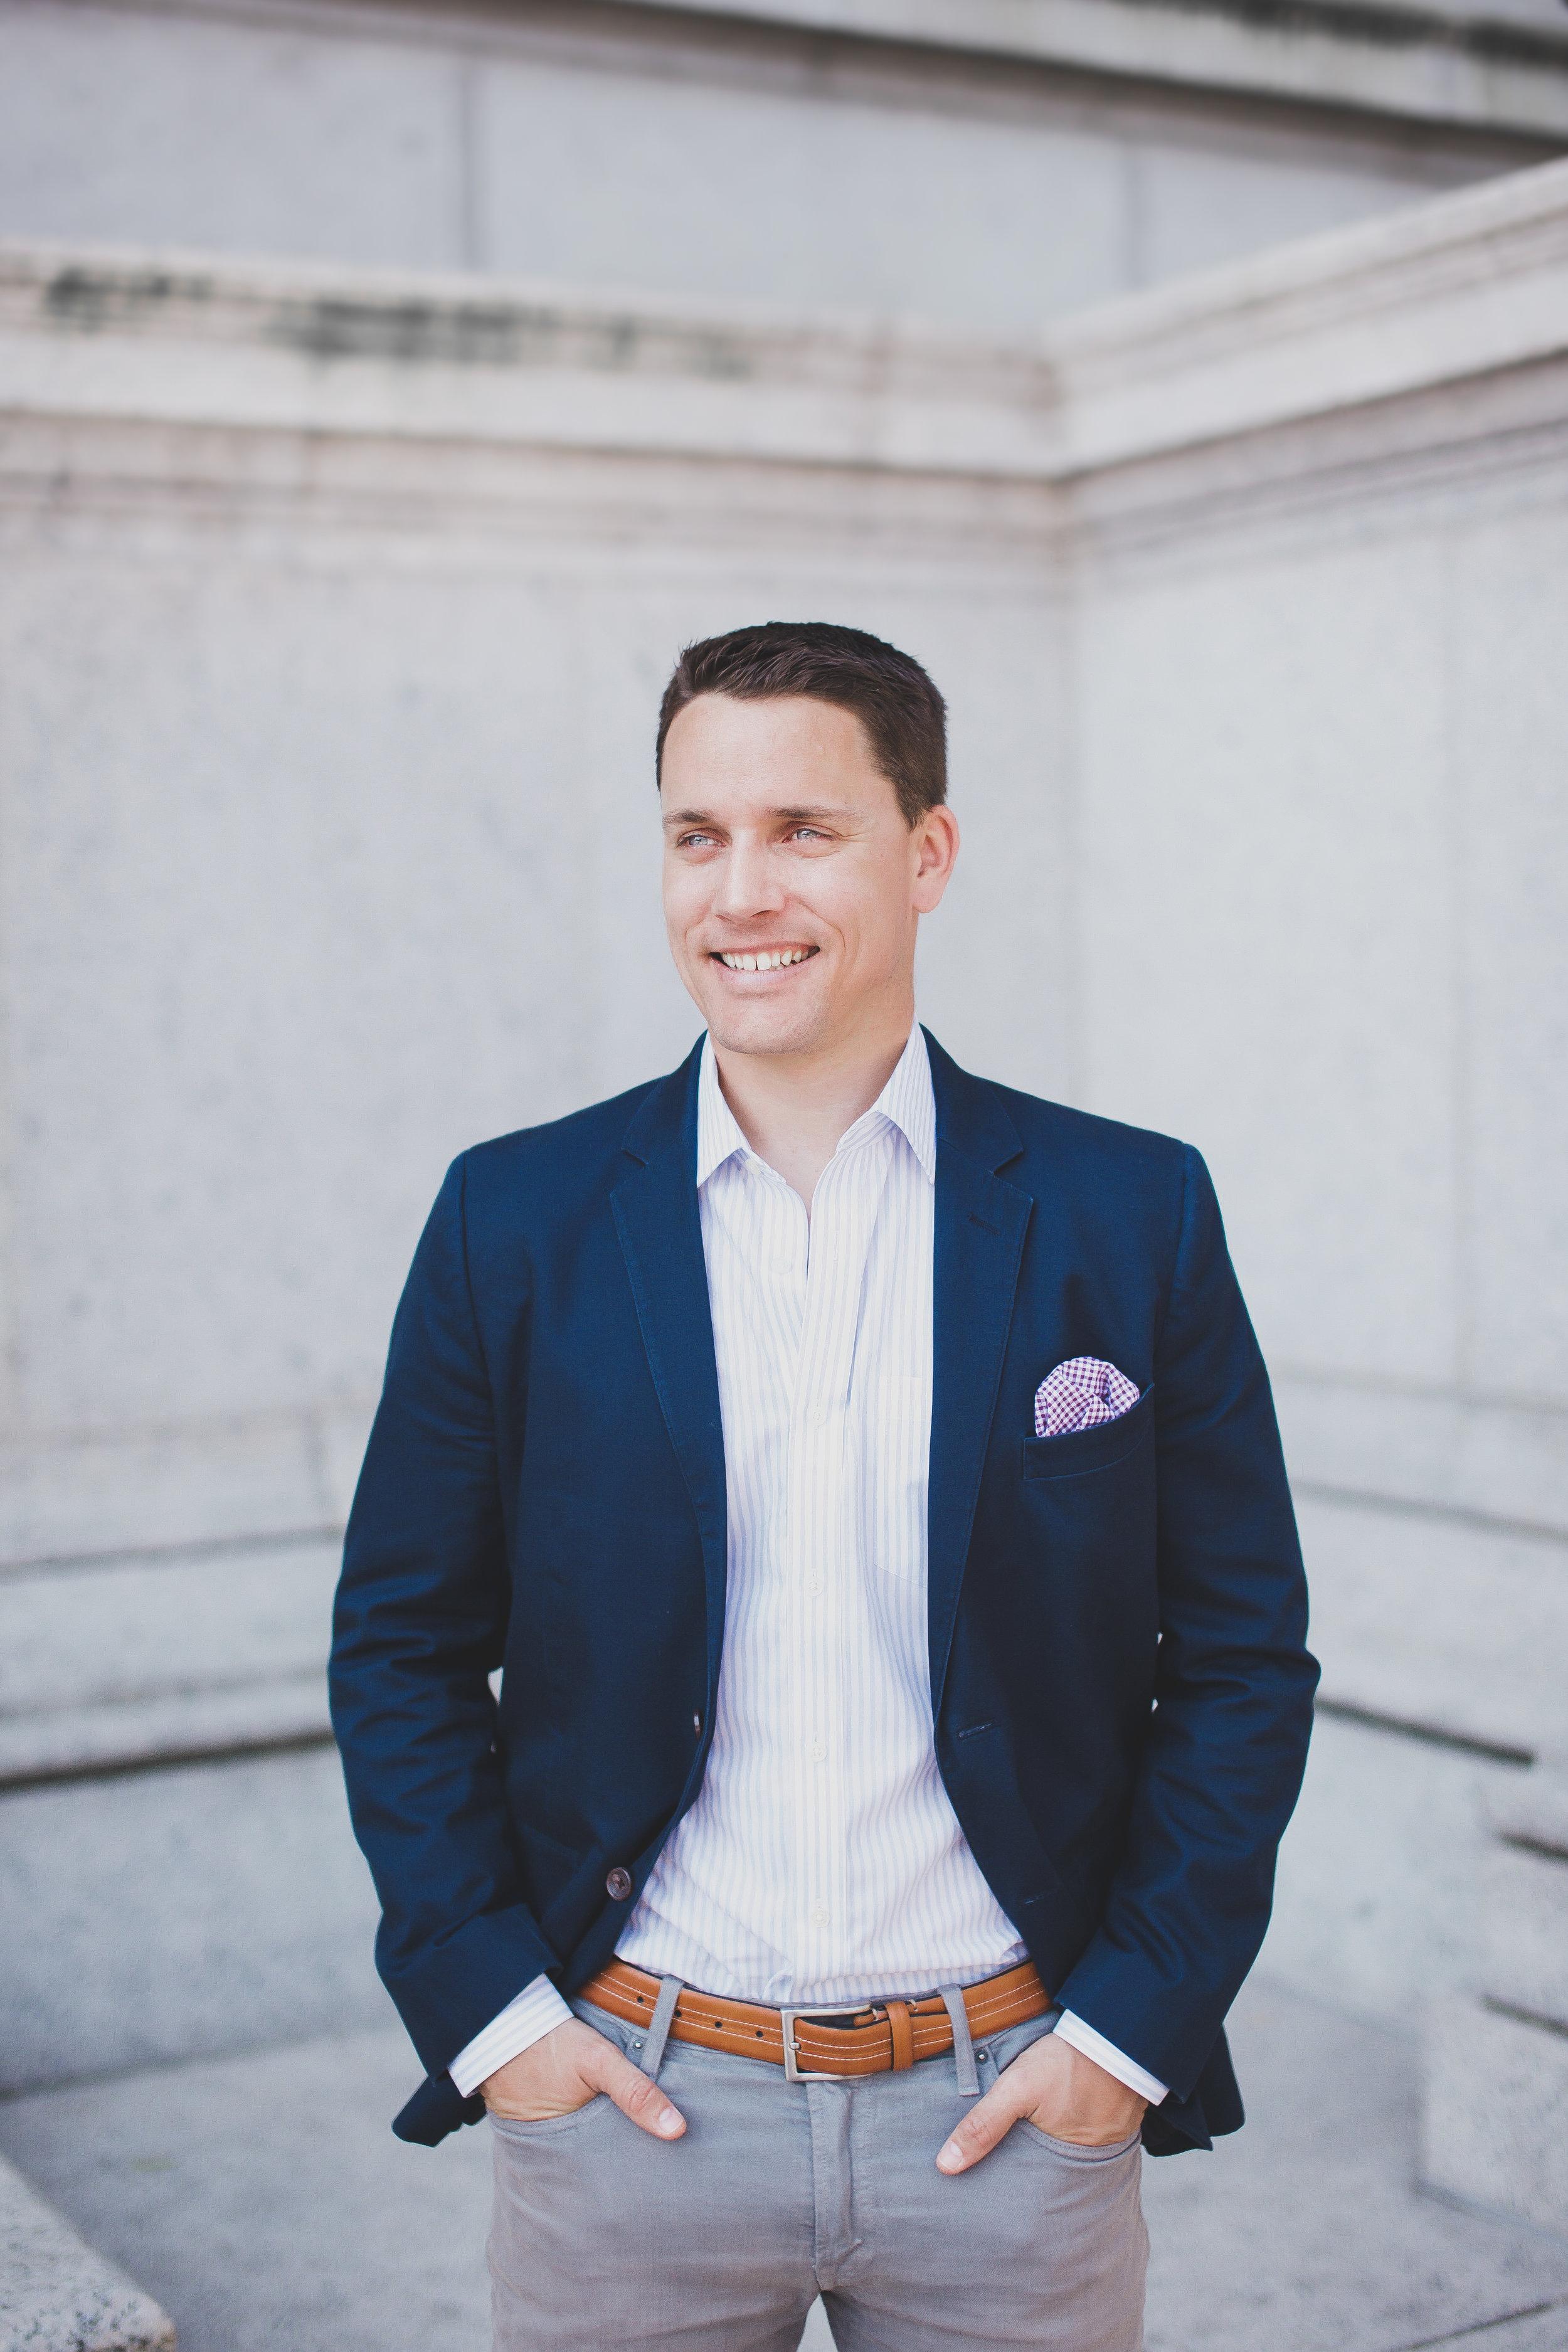 Erik Dreyer, co-founder of GoodShuffle